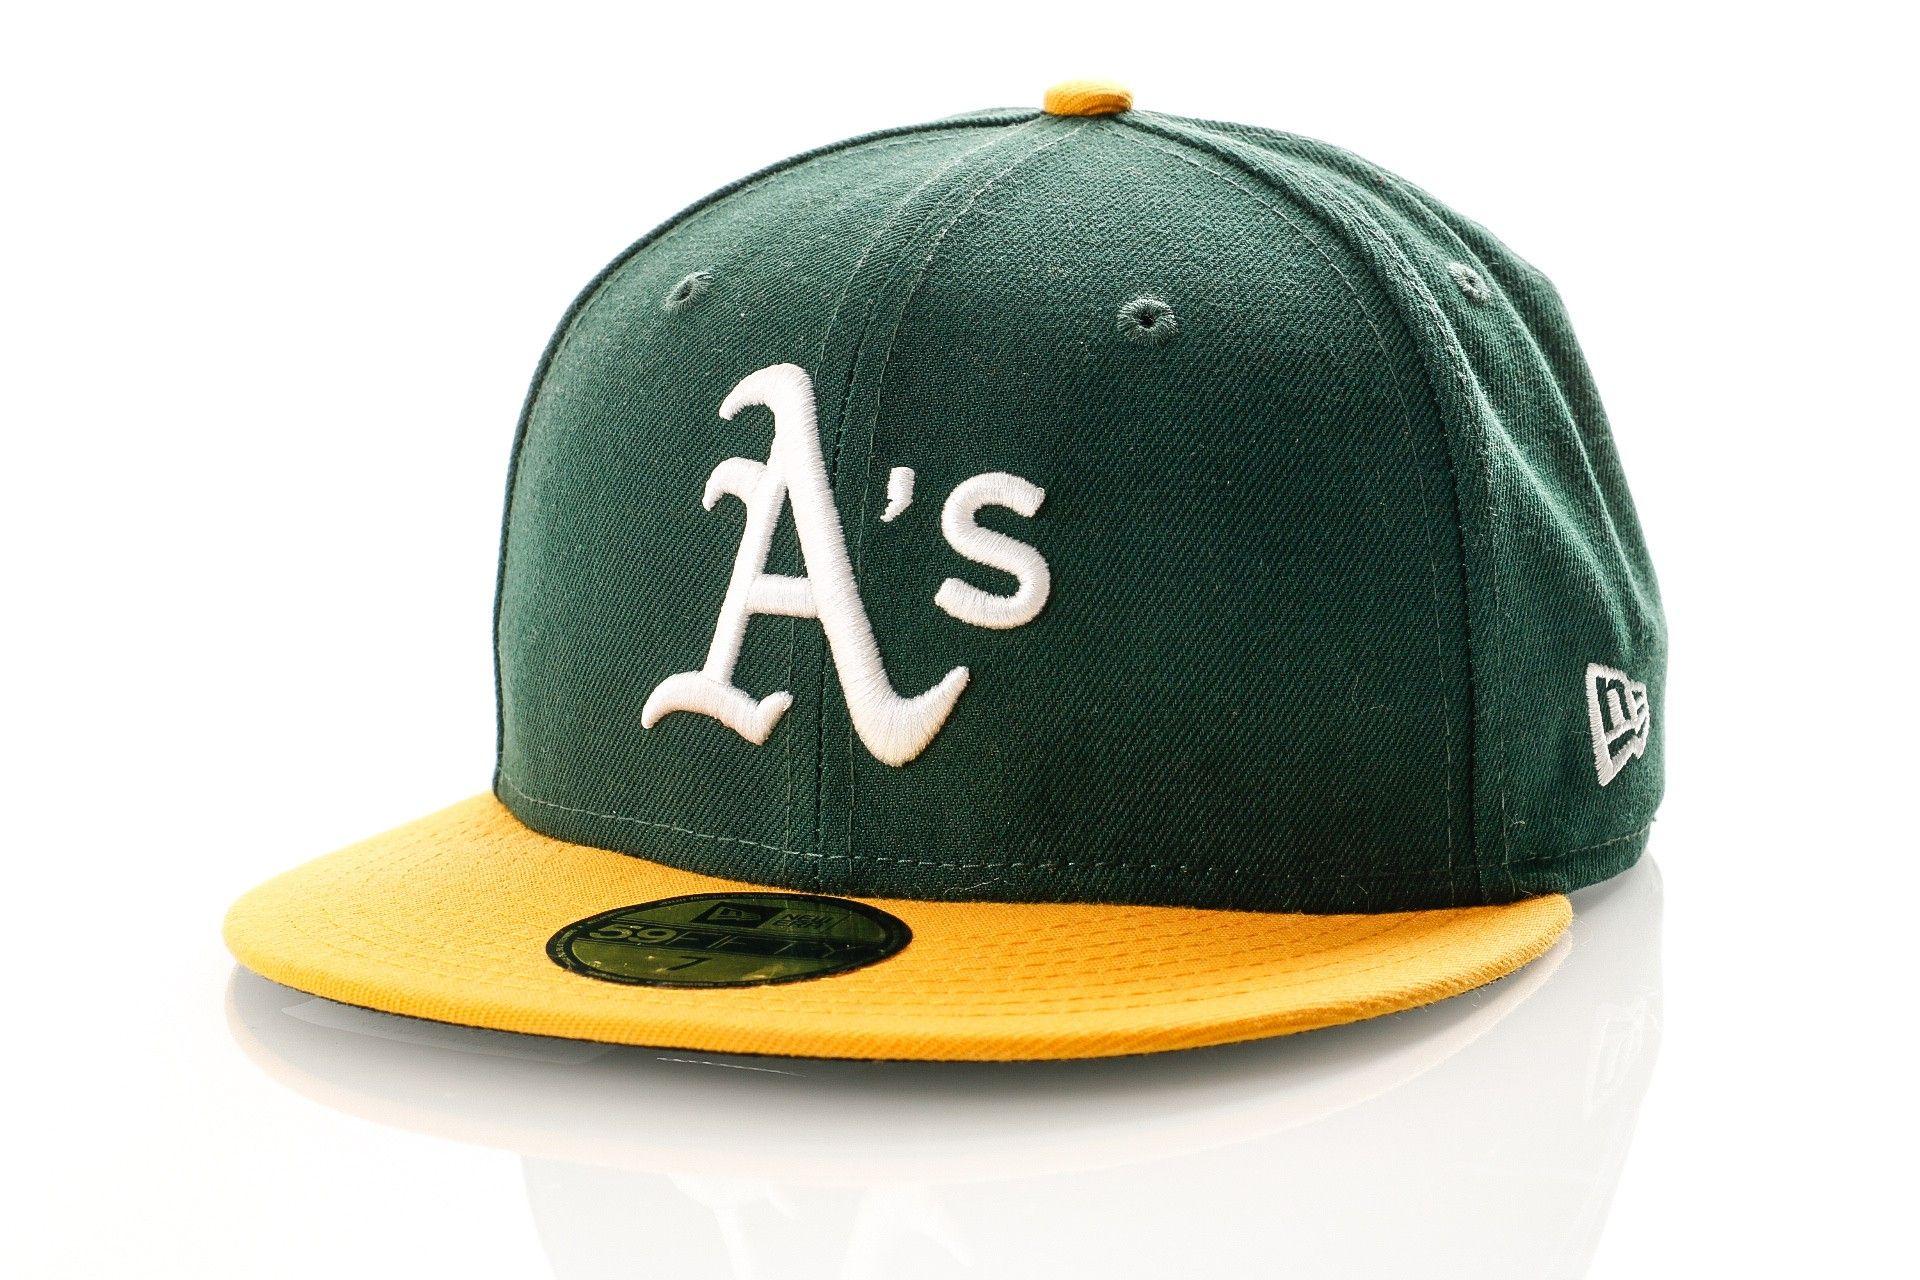 Afbeelding van New Era Fitted Cap Oakland Athletics AC PERF 5950 OAKLAND ATHLETICS 70361054